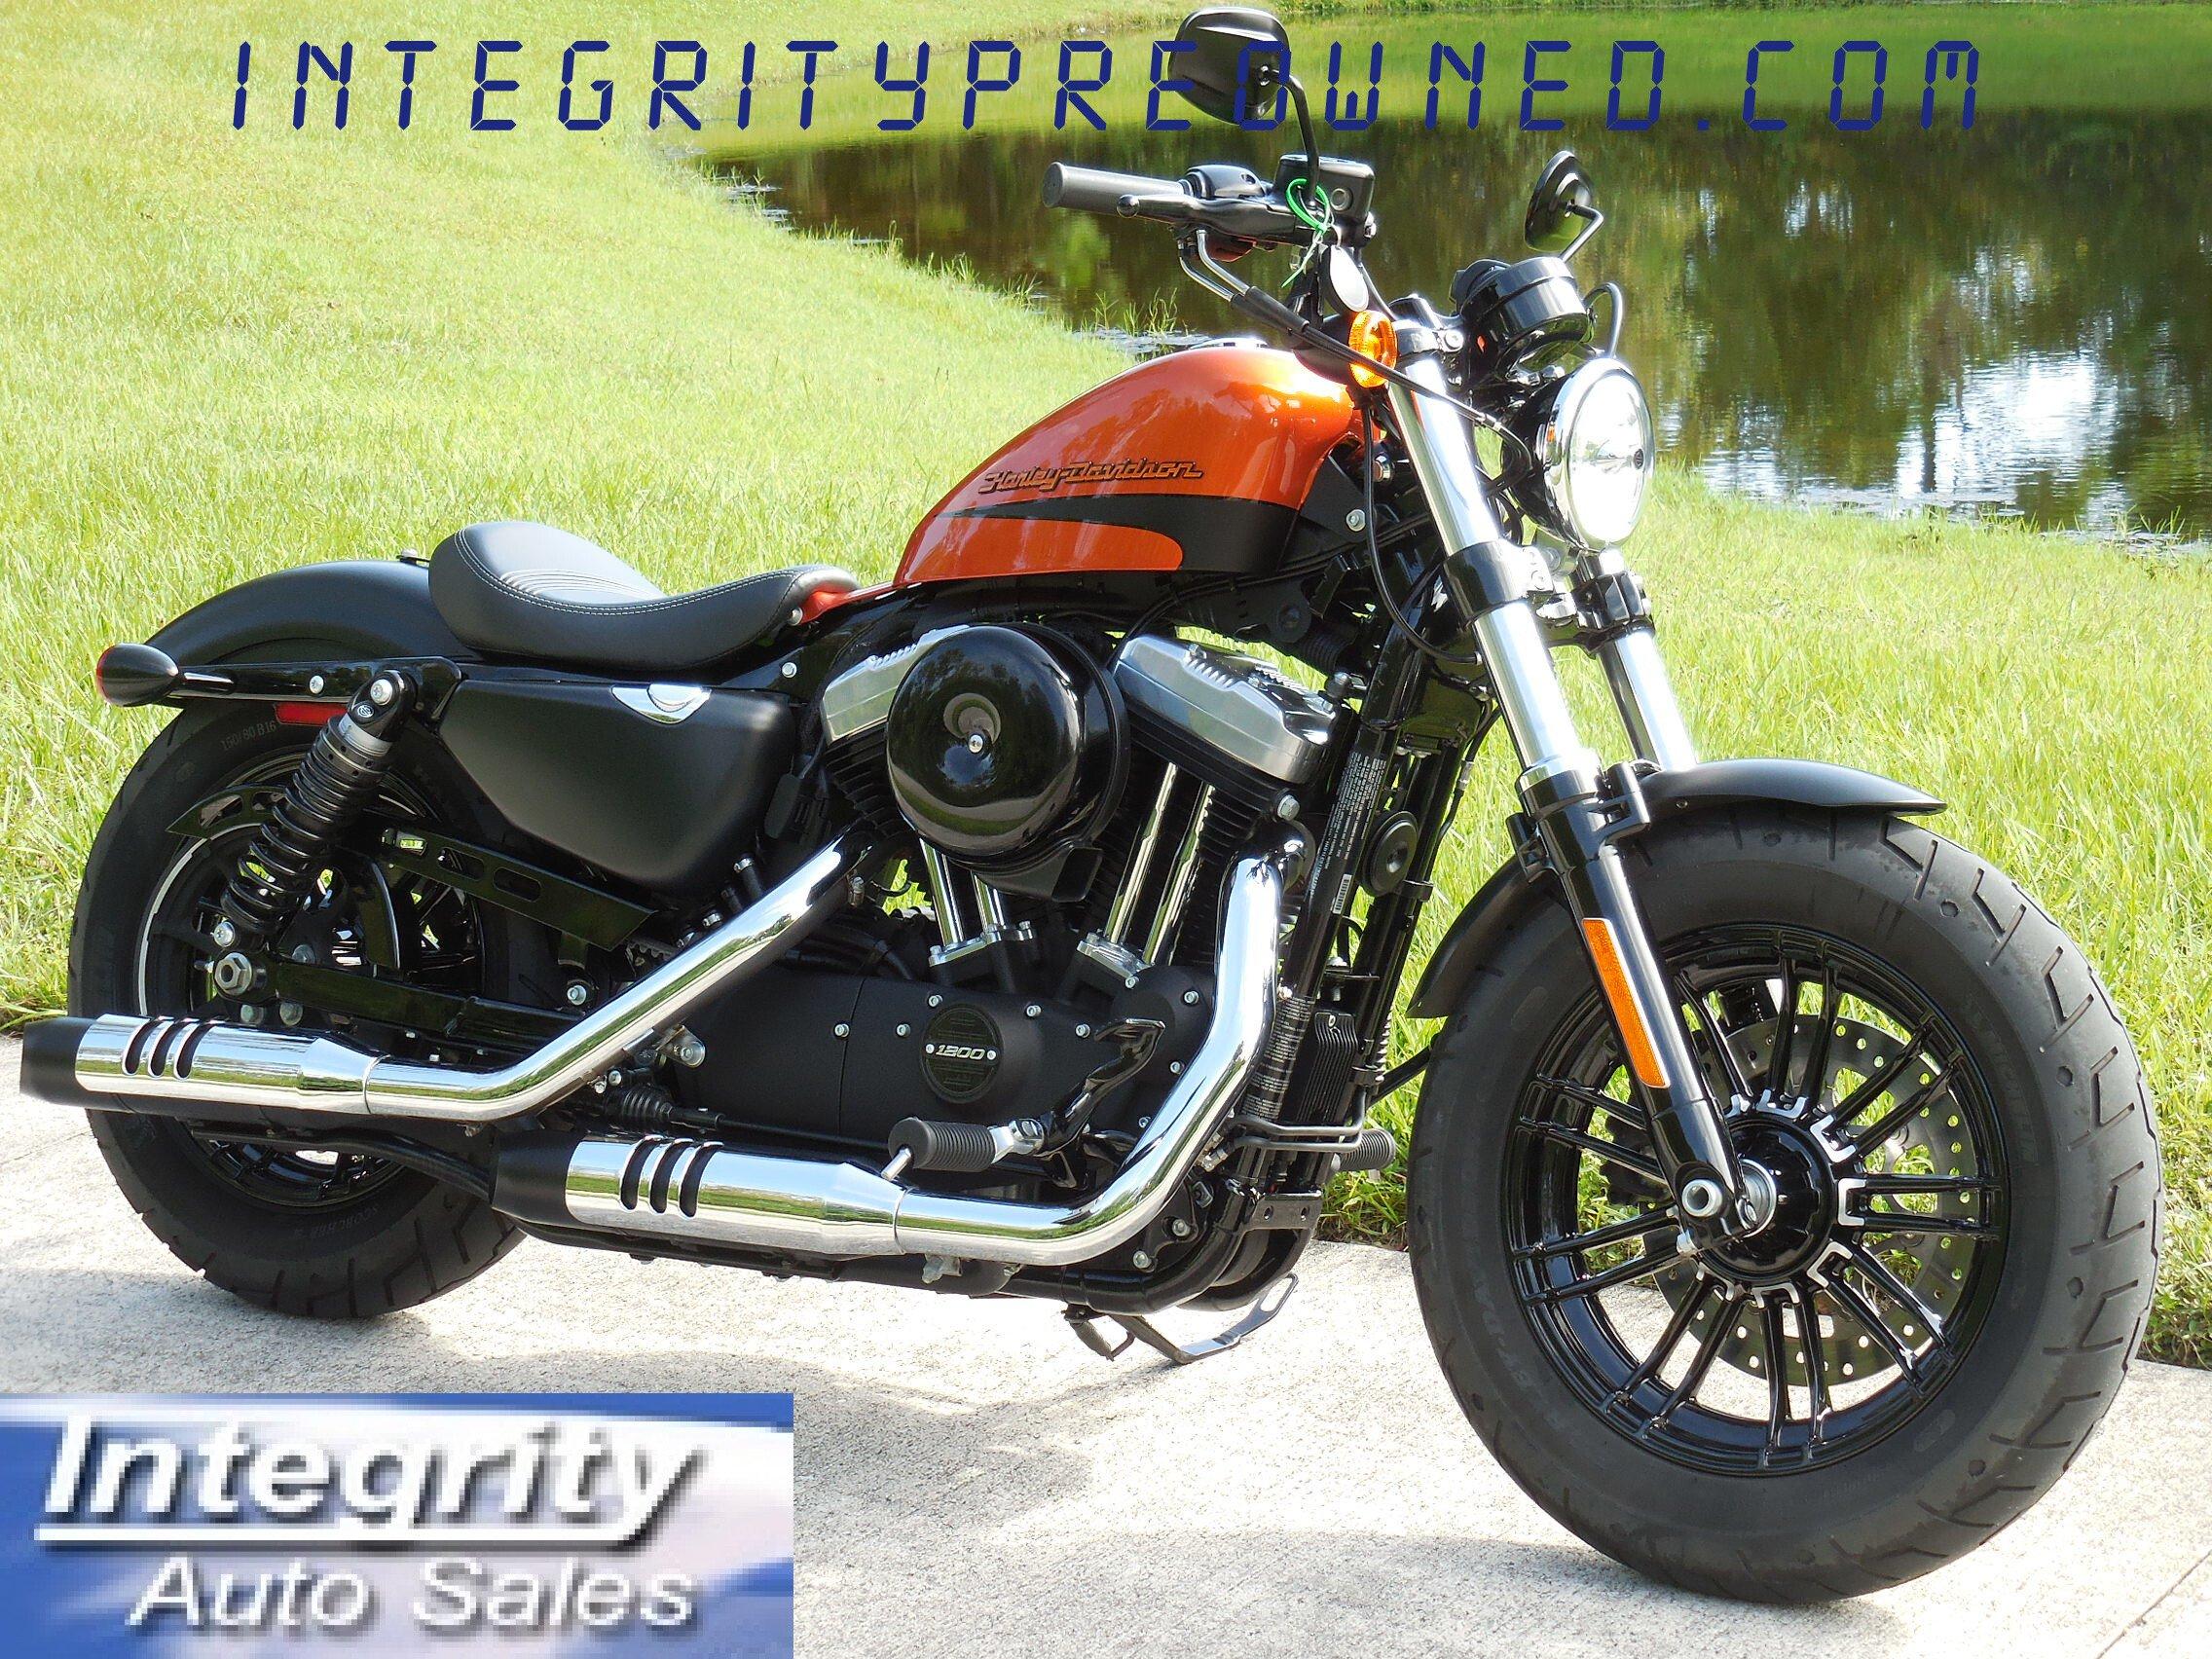 2019 Harley Davidson Sportster Forty Eight For Sale Near Port Orange Florida 32127 Motorcycles On Autotrader